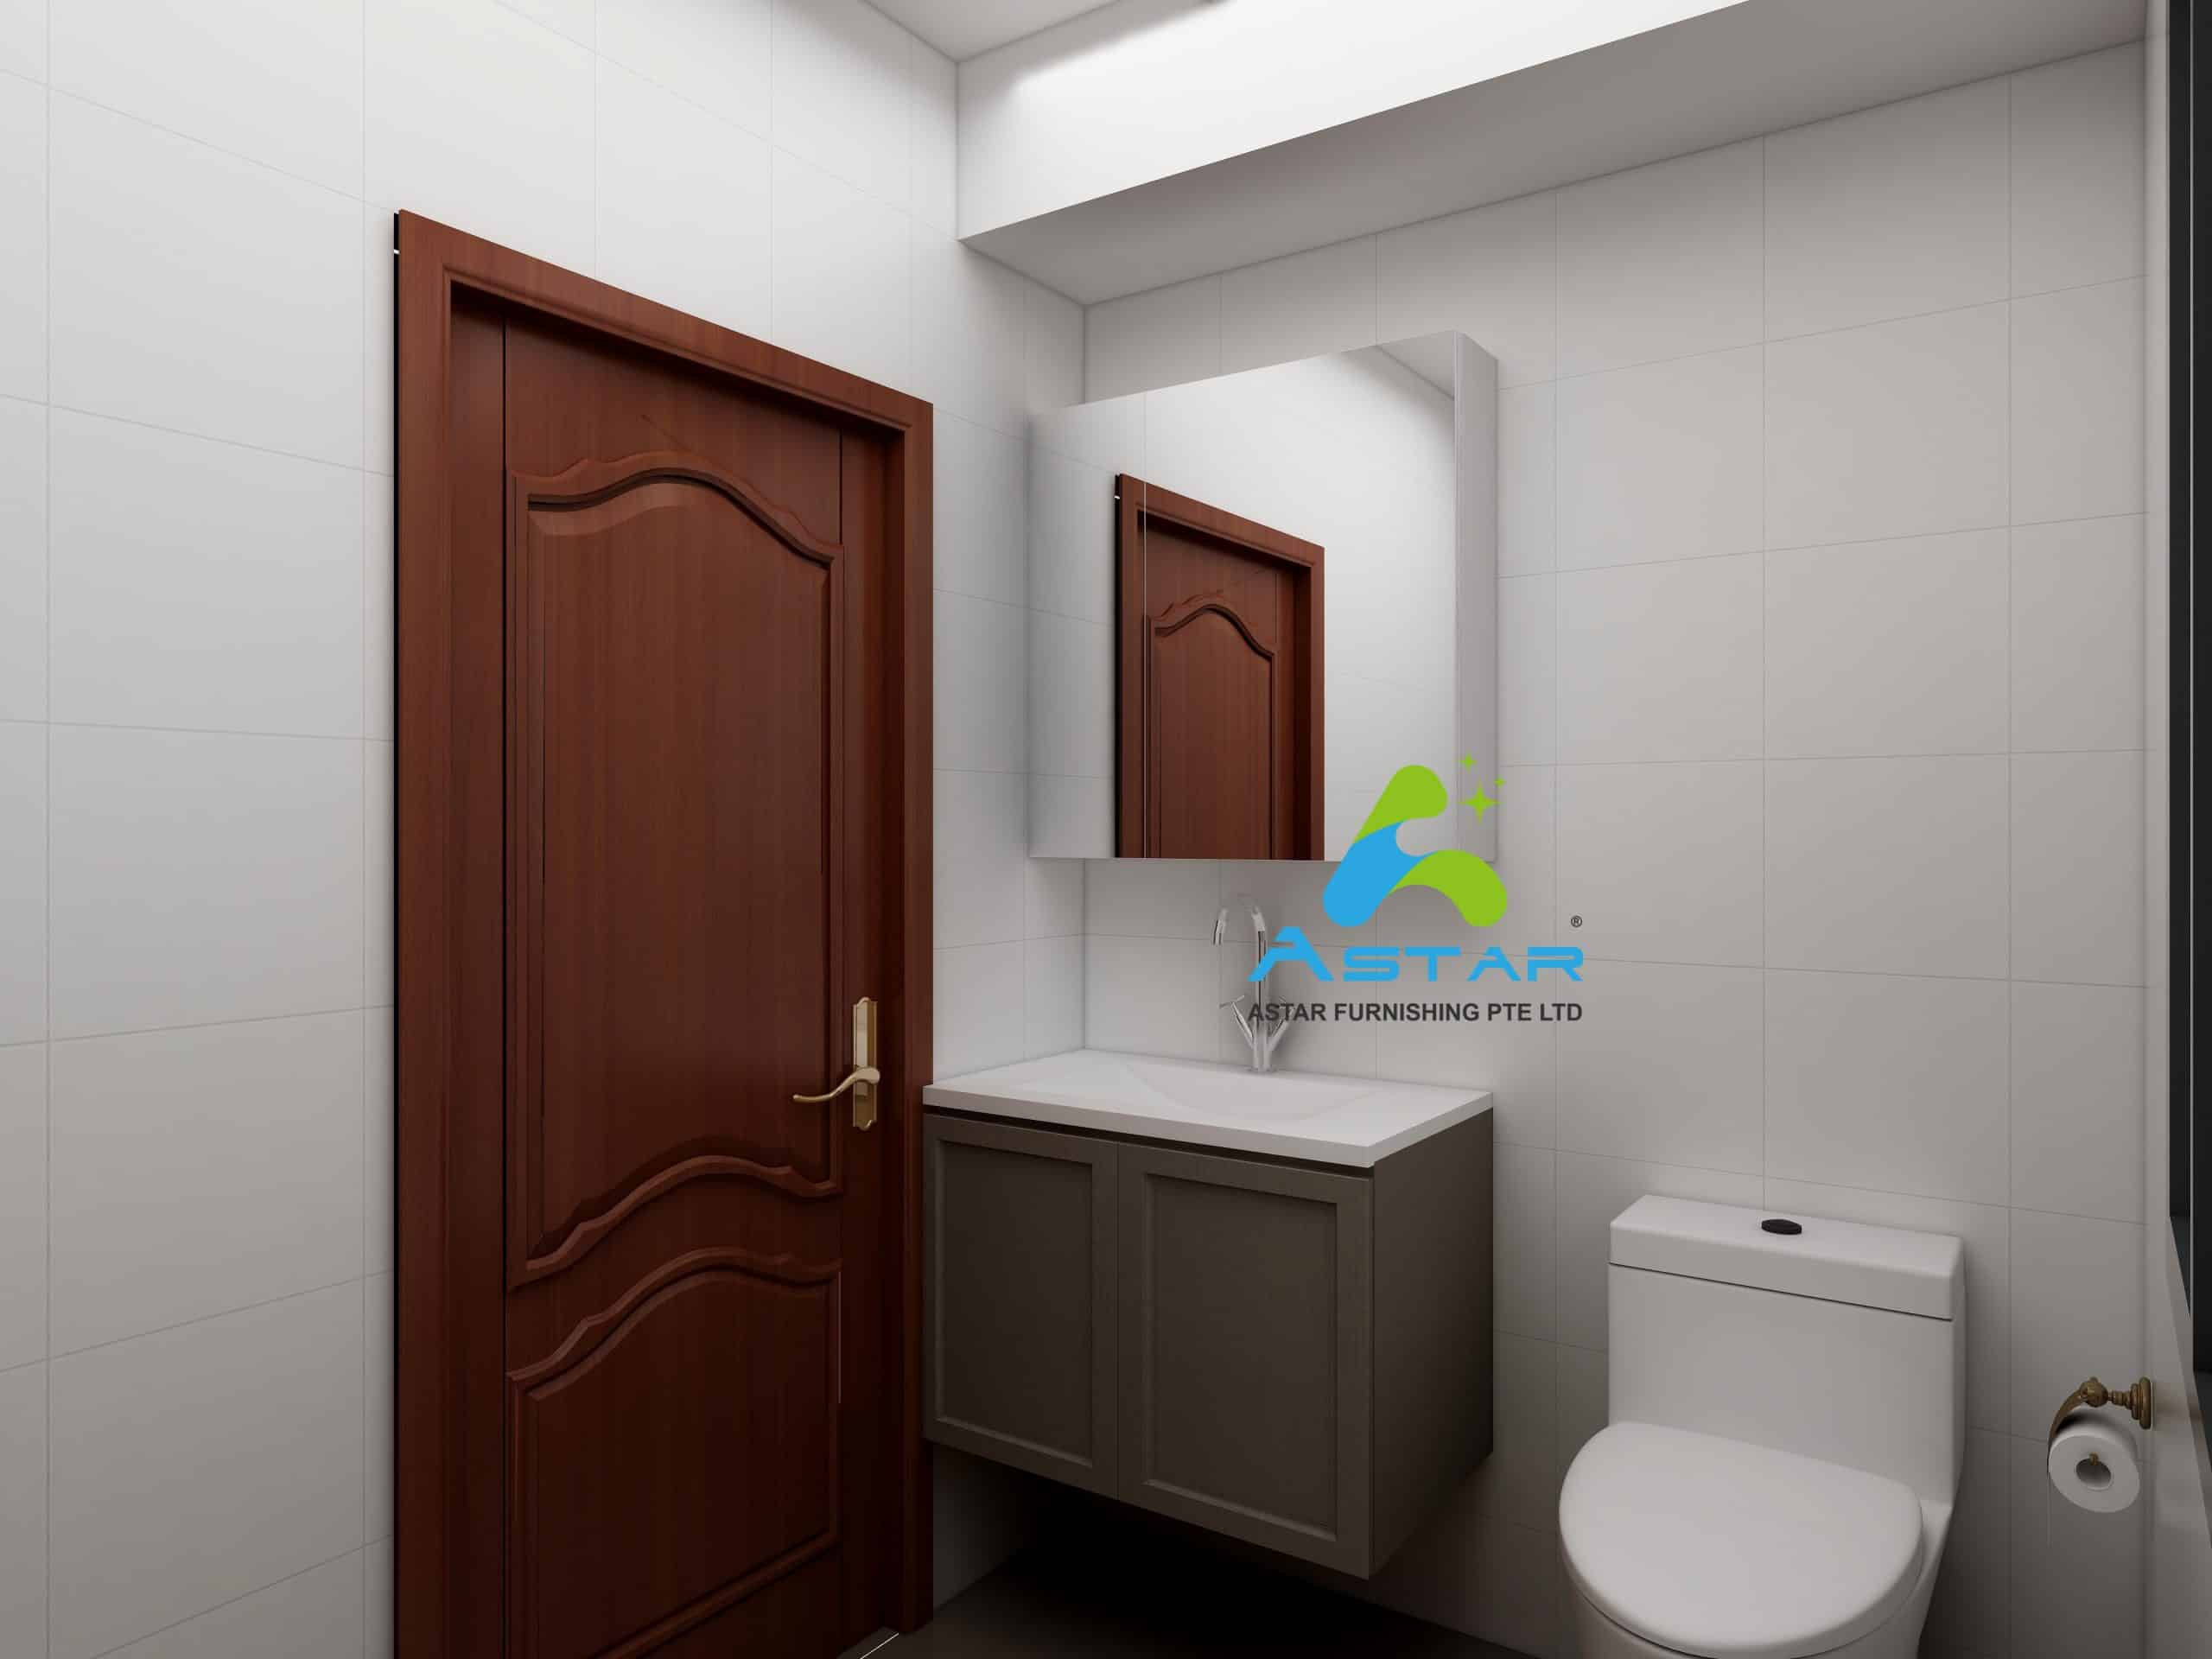 a star furnishing aluminium projects 12. Blk 325B Sumang Walk 061 scaled